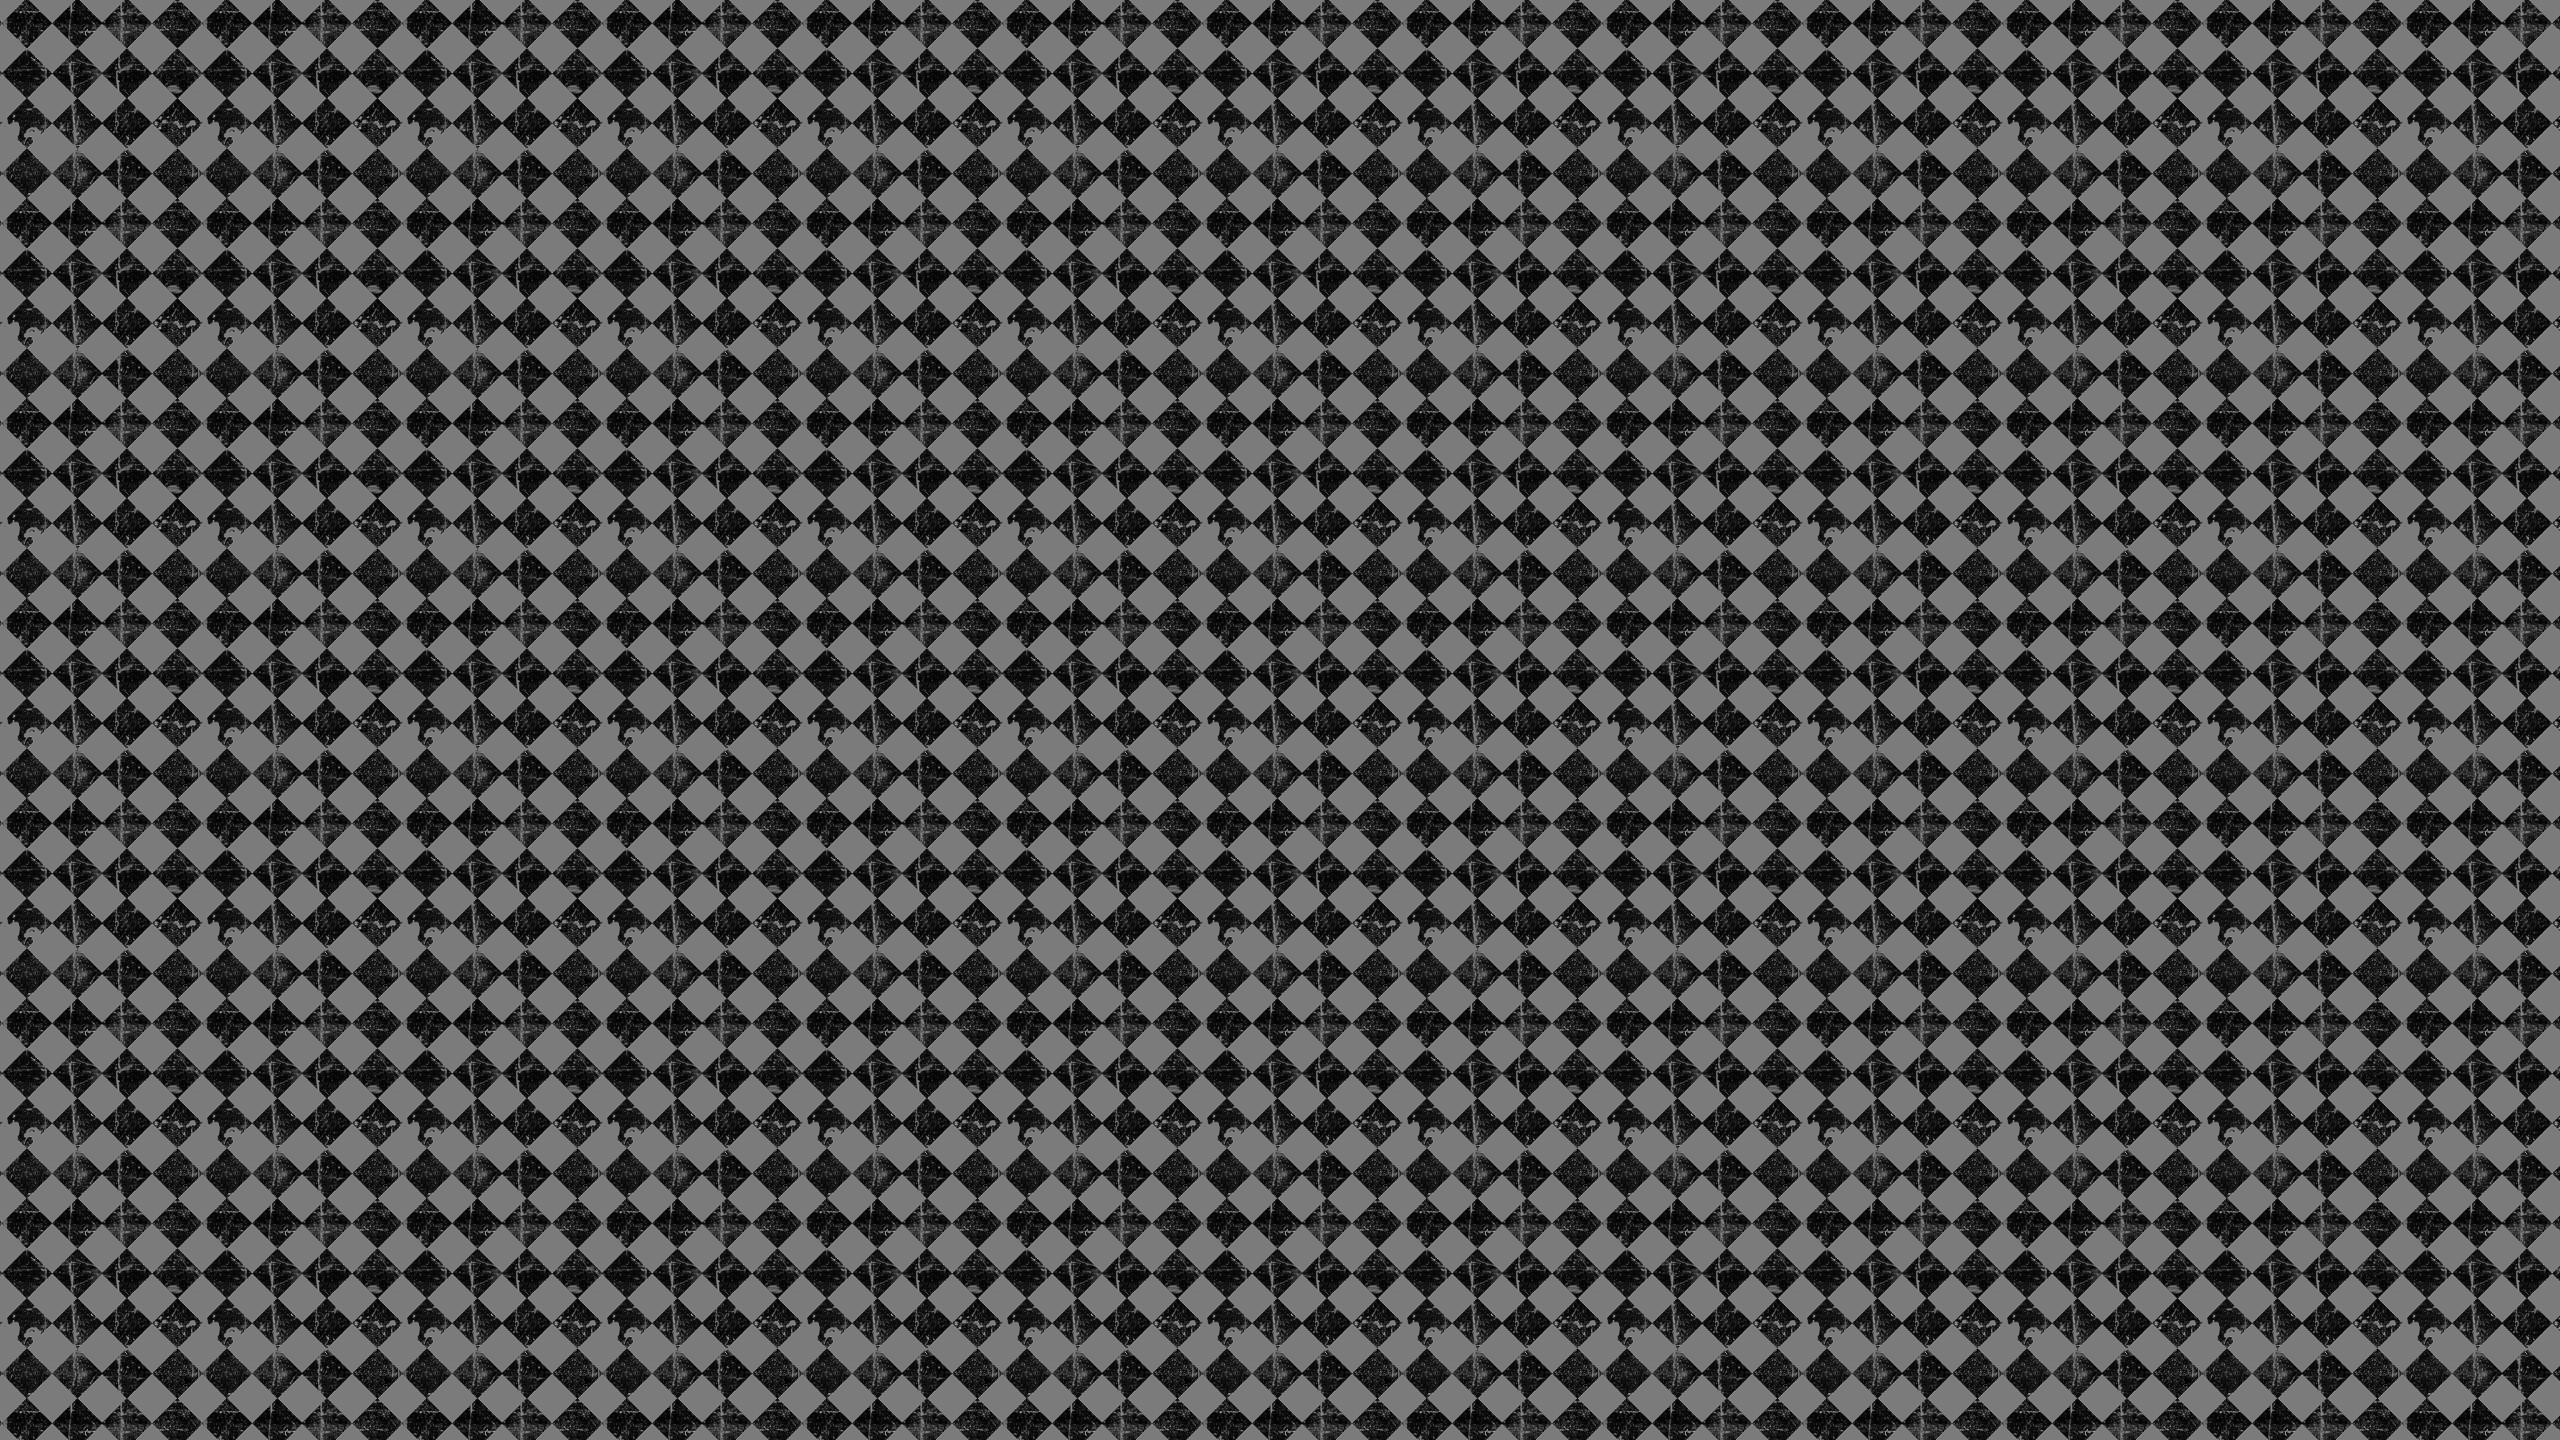 Res: 2560x1440, Grey Grunge Checkers Desktop Wallpaper